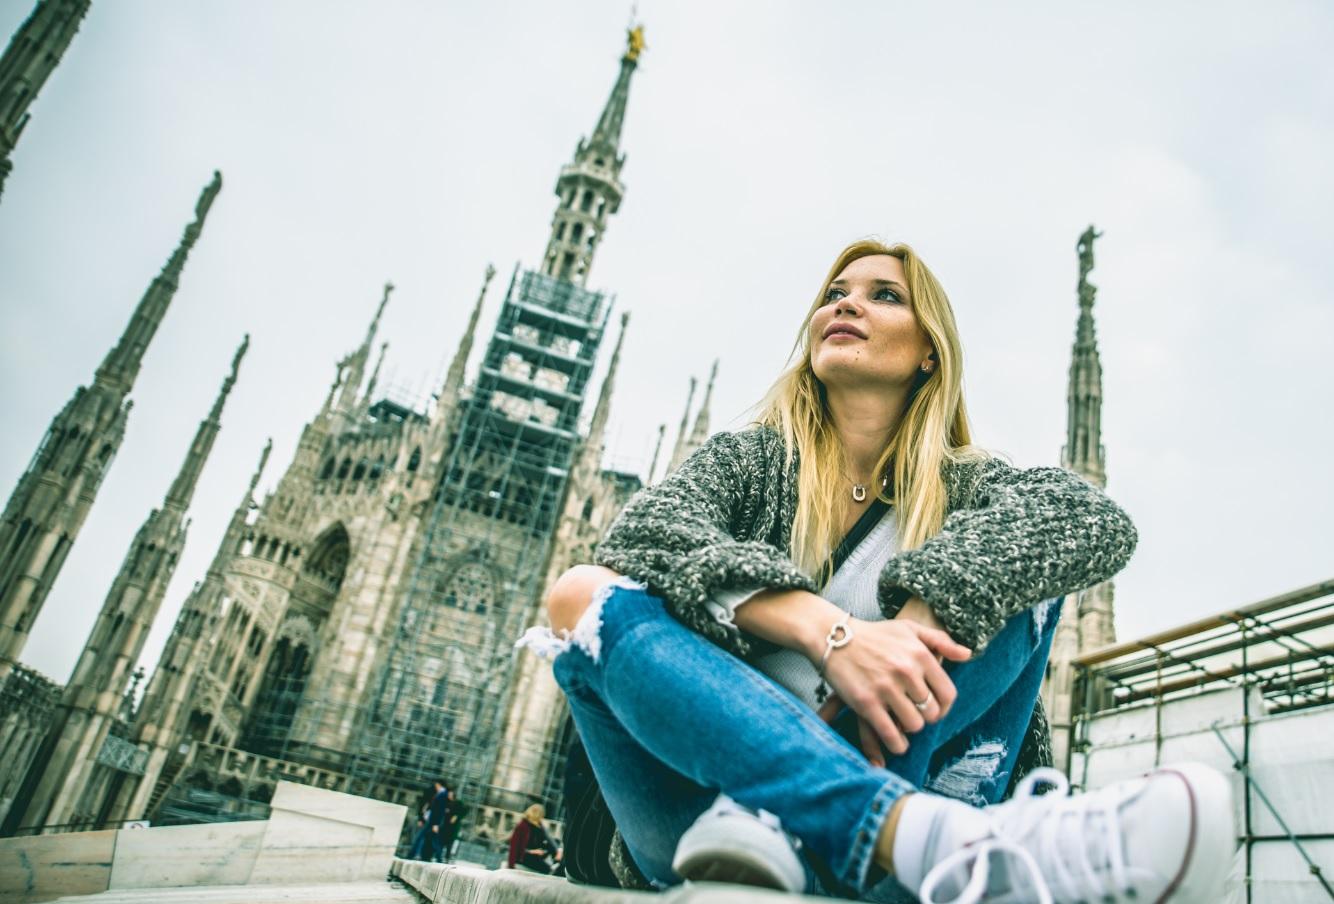 Ukrainian girls in Italy.